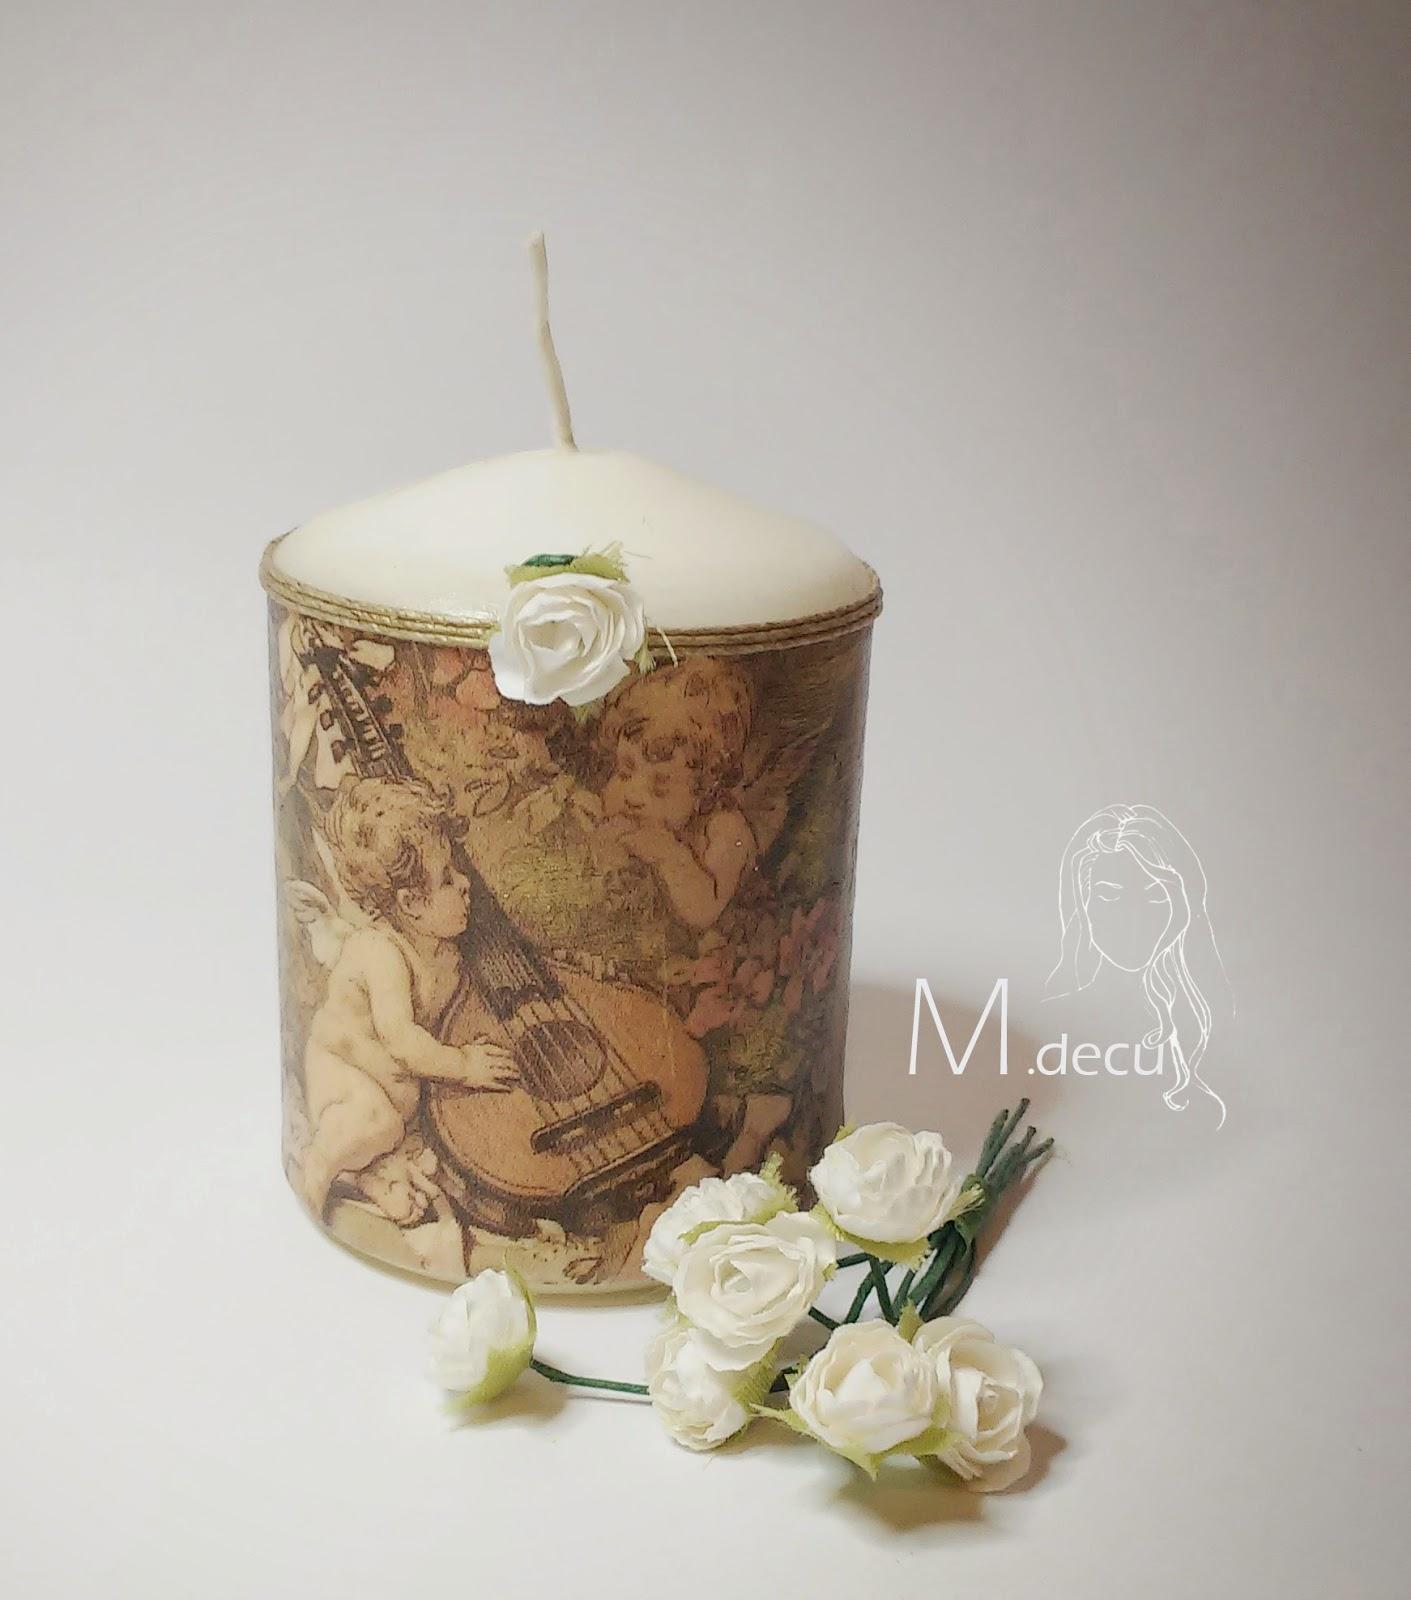 http://mdecu.blogspot.com/2014/12/swiateczna-swieca-christmas-candle.html